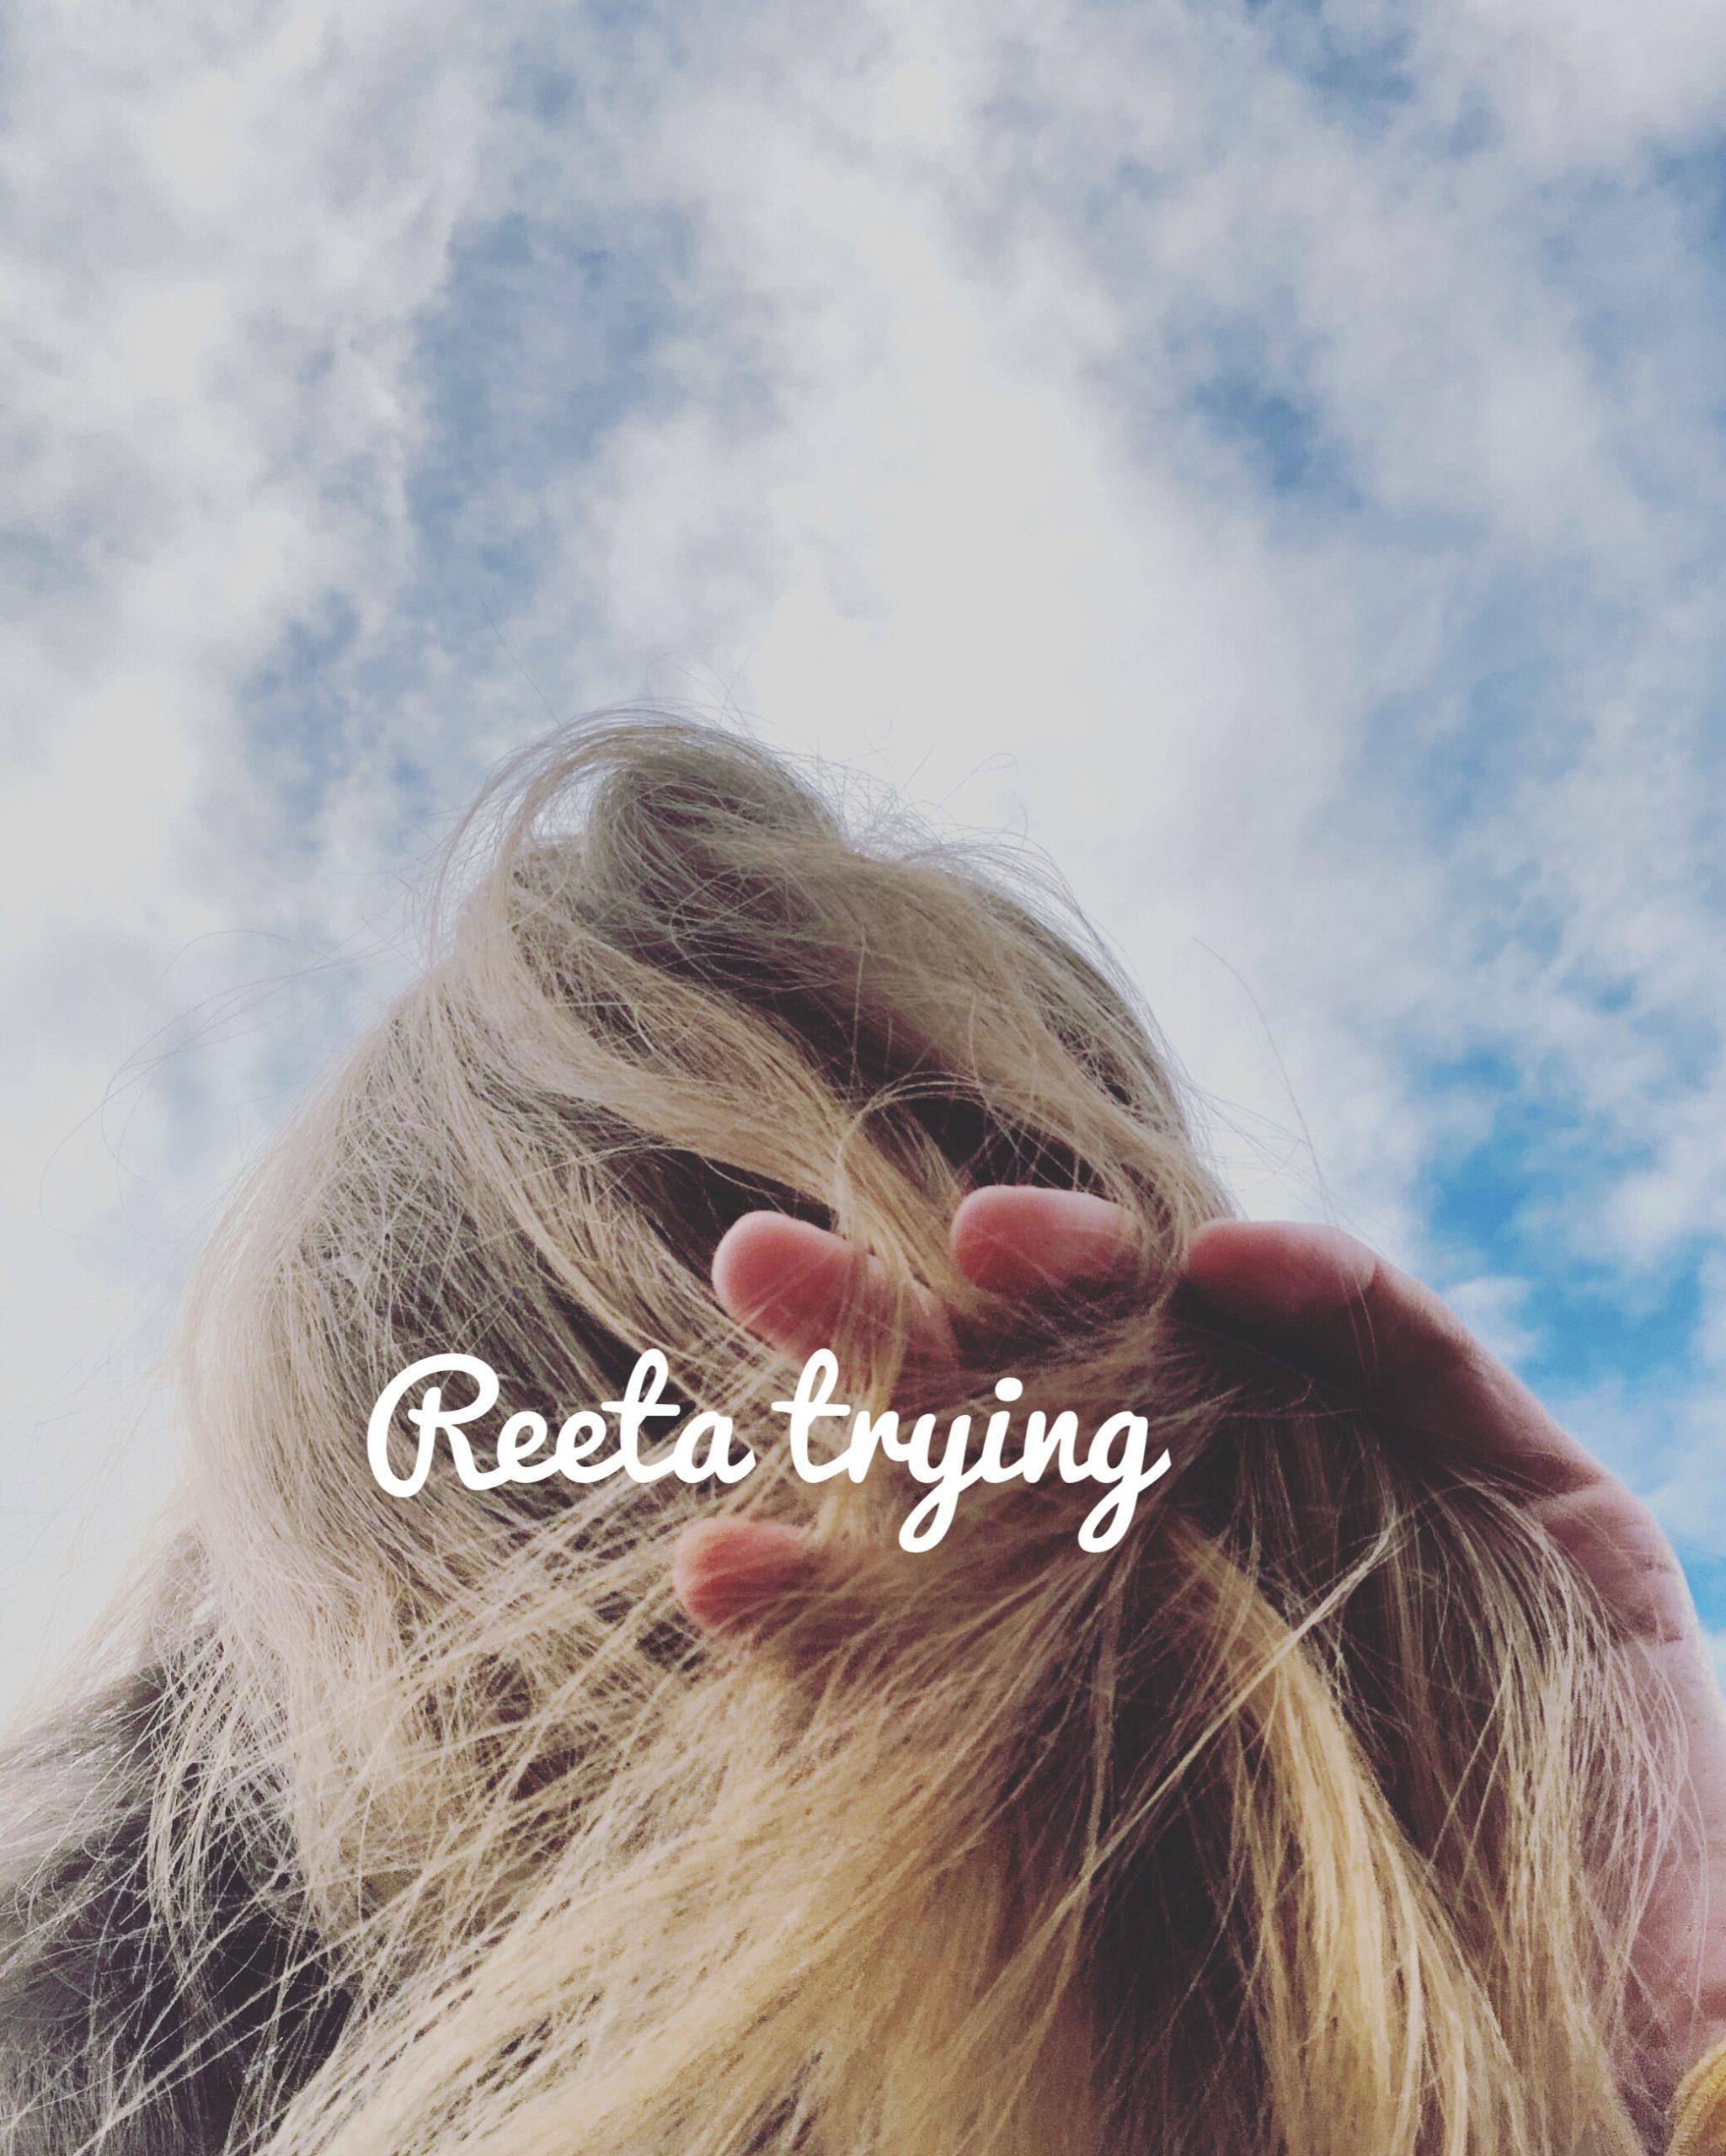 Reeta trying